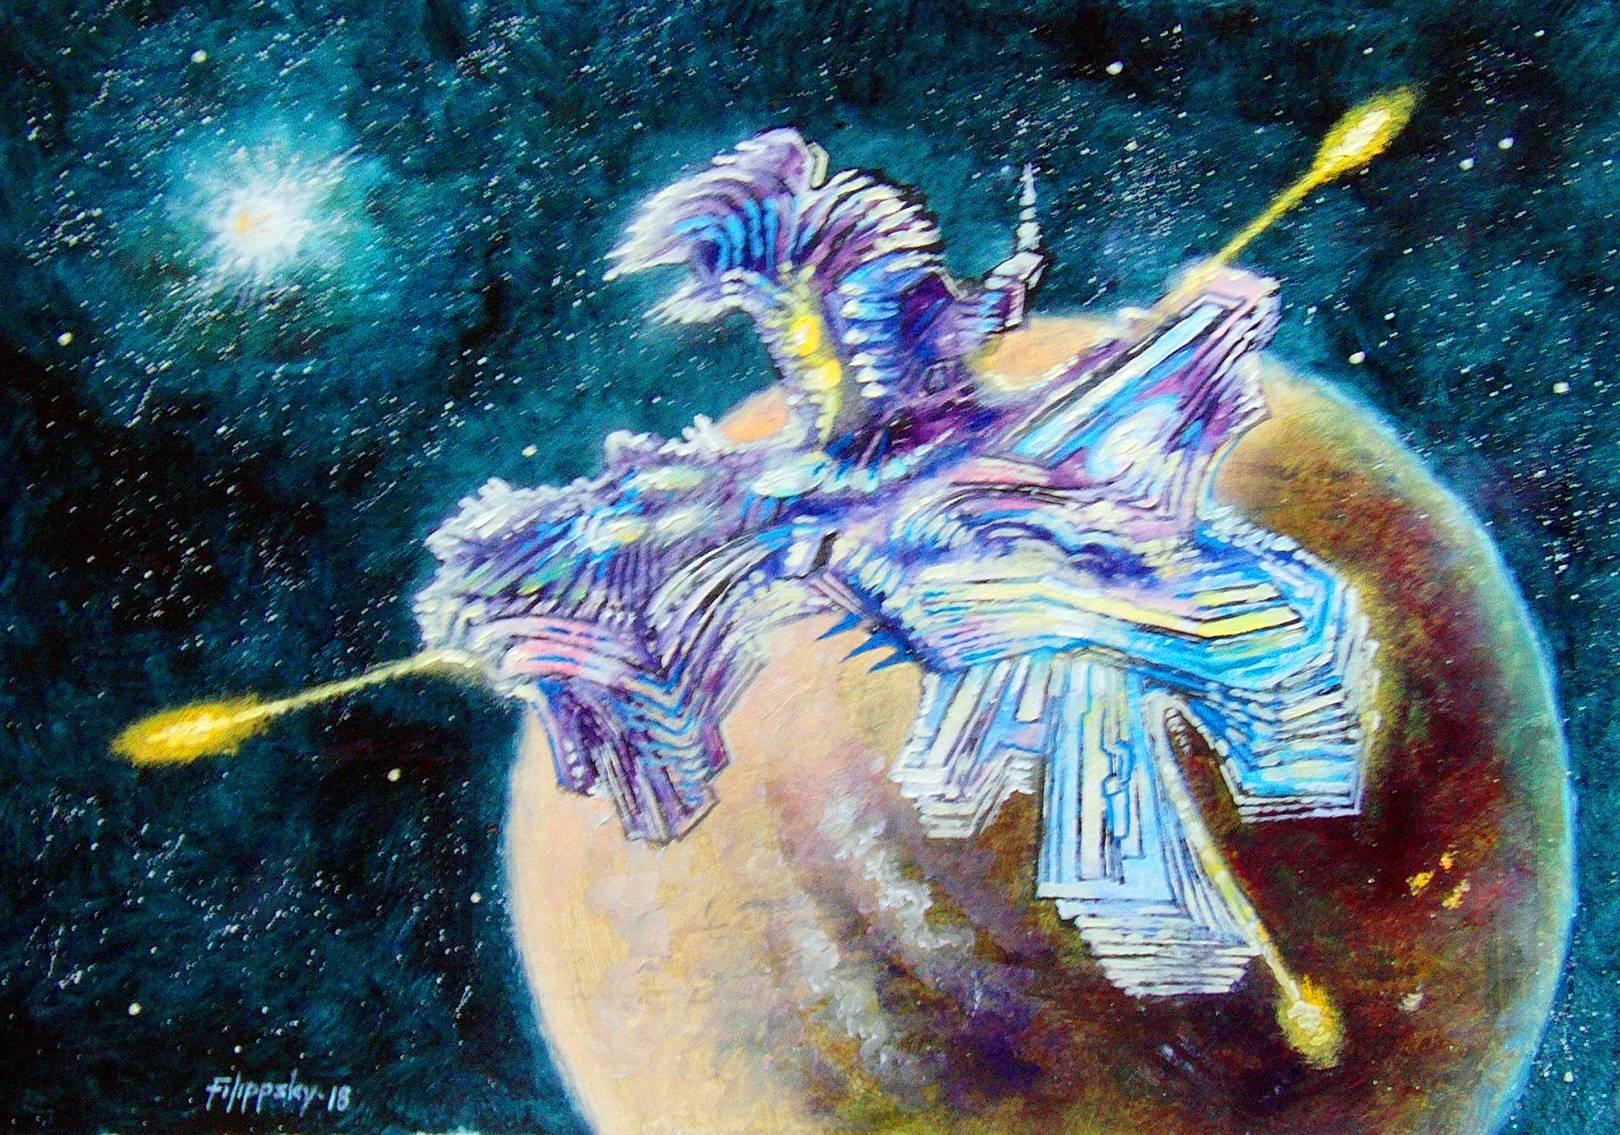 Нэсти-легендарная луна Венеры.